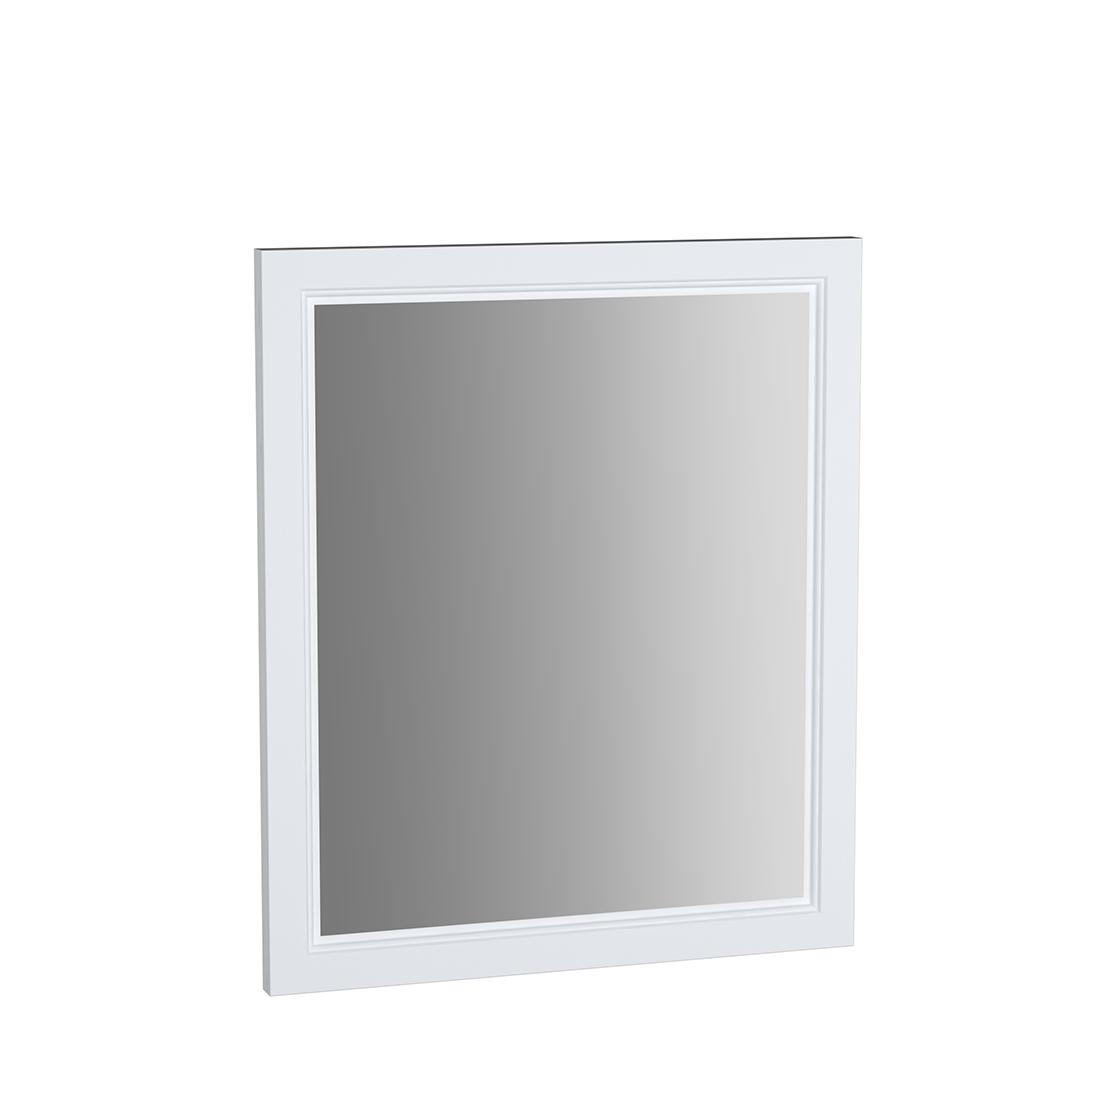 Valarte miroir, 65 cm, blanc mat